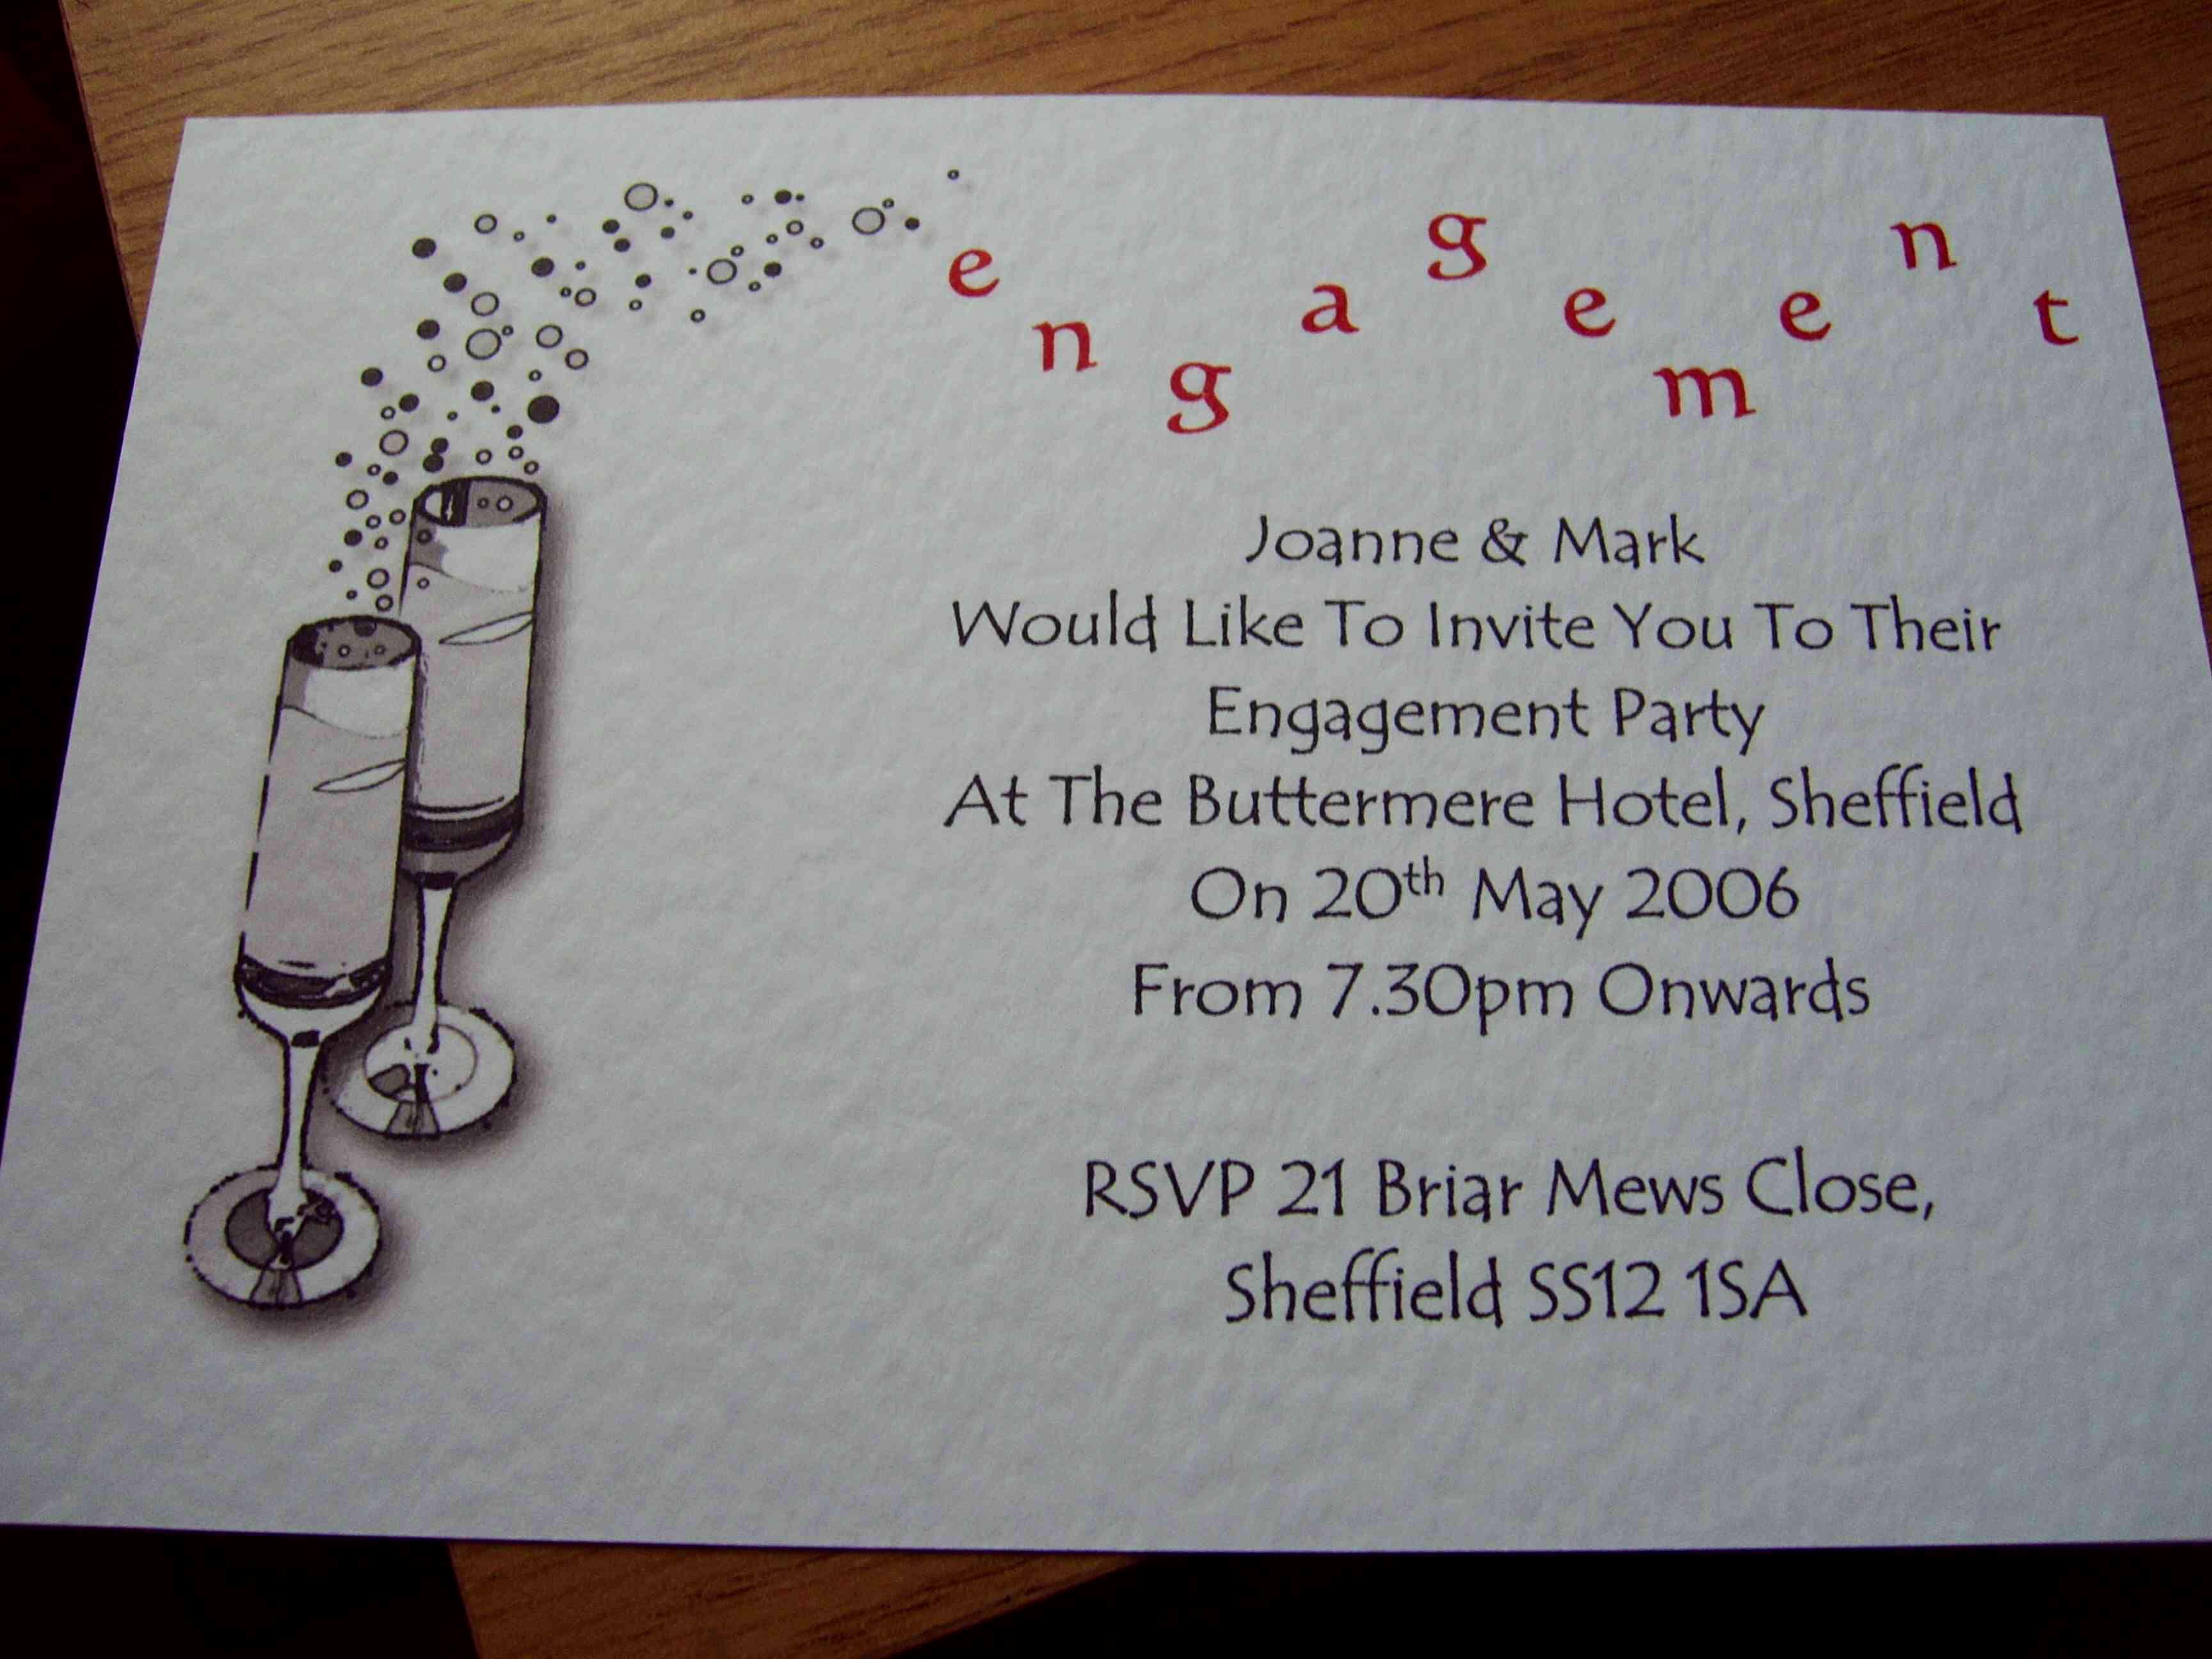 Free Engagement Party Invitation Templates Printable Fresh  Image - Free Printable Engagement Party Invitations